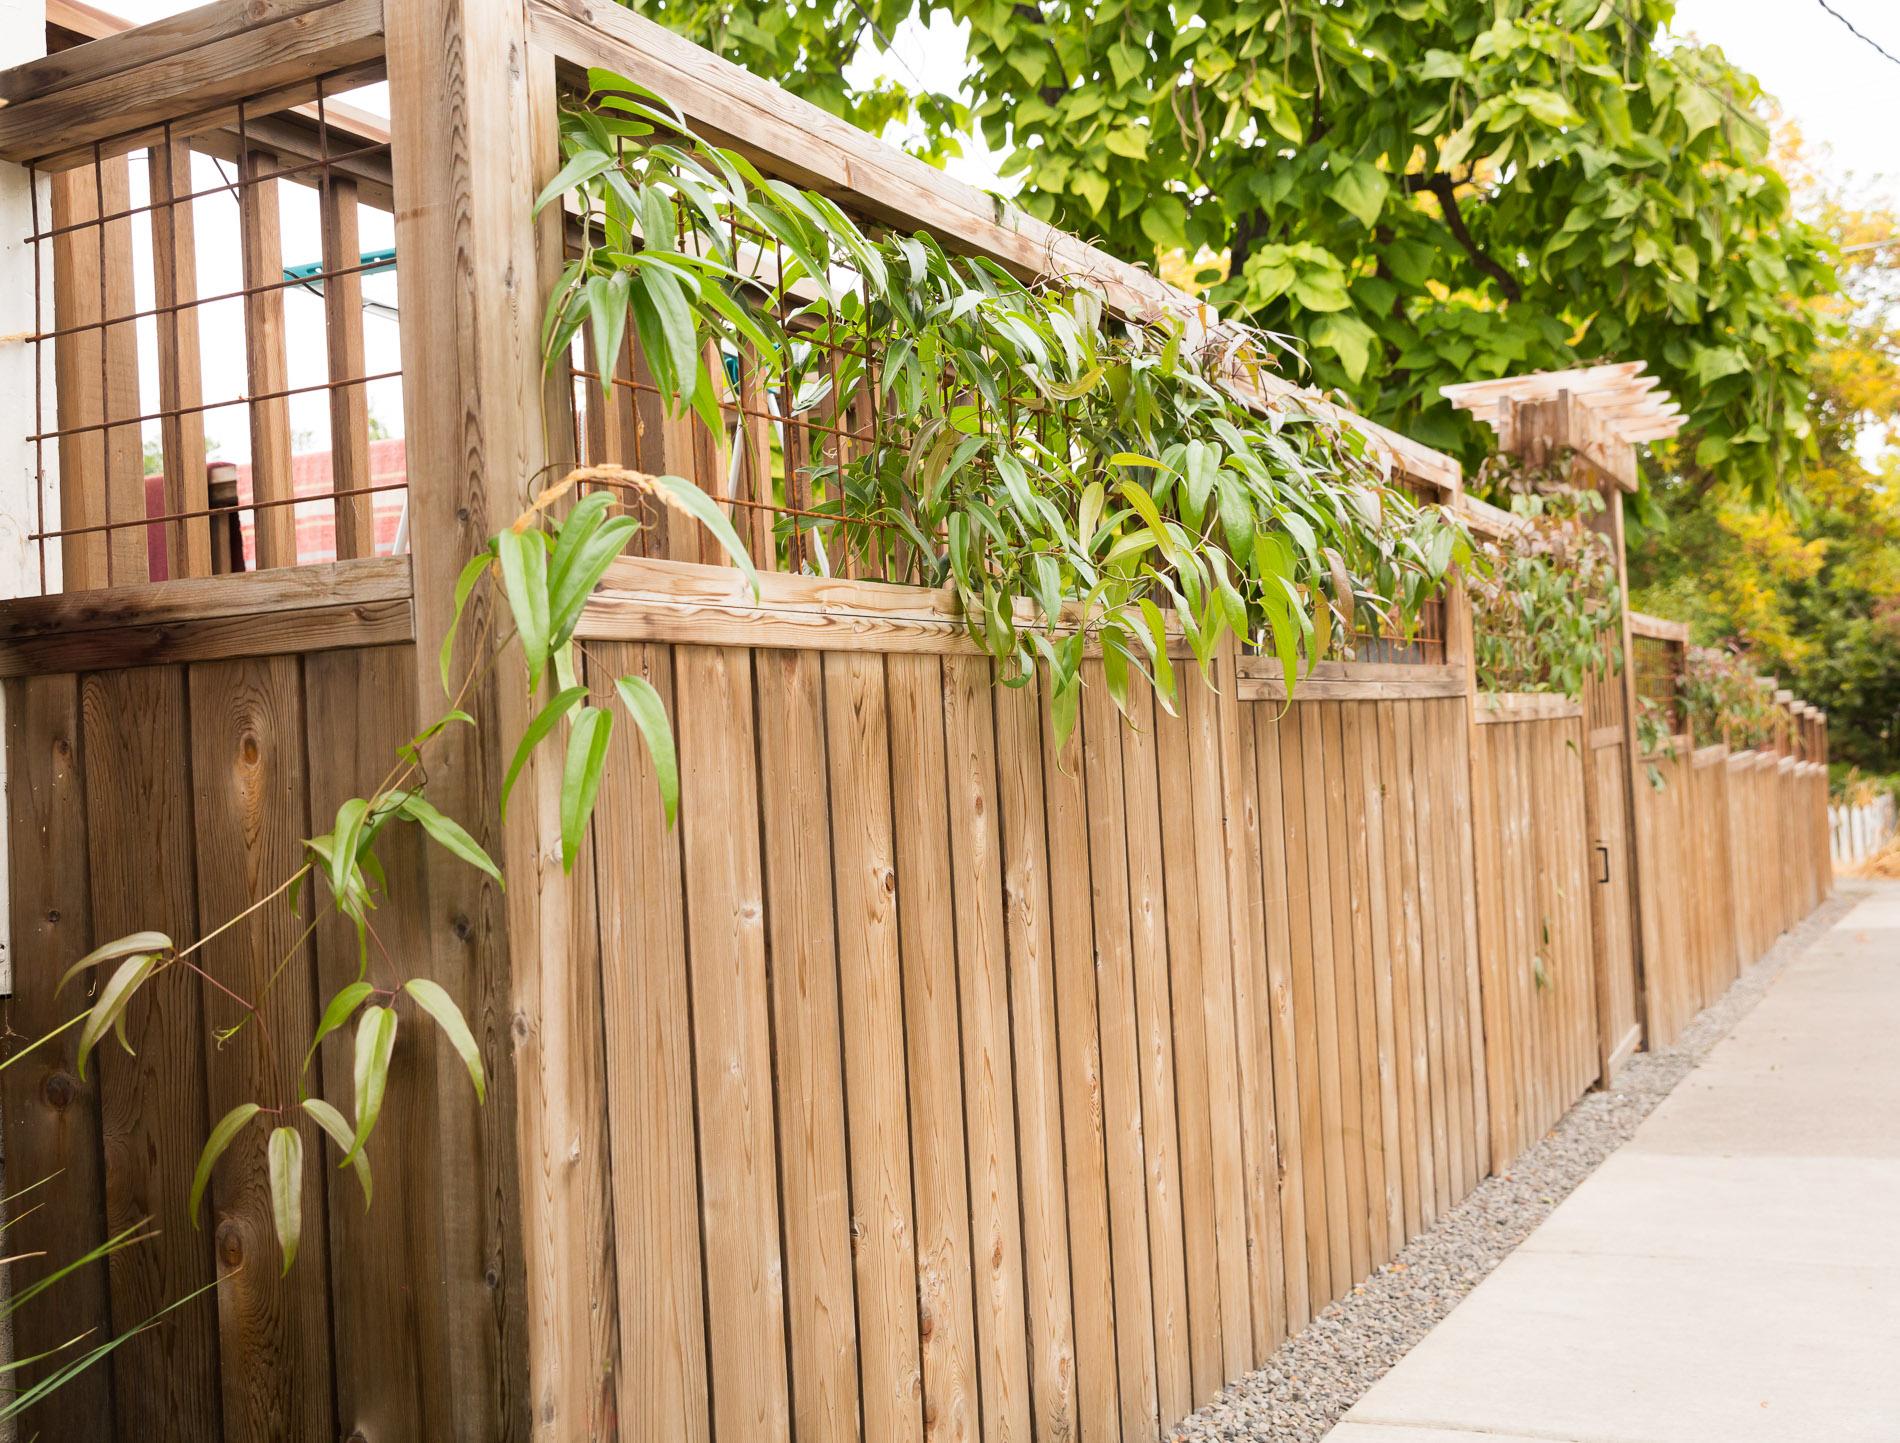 Urban Privacy Fence + Climbing Vines